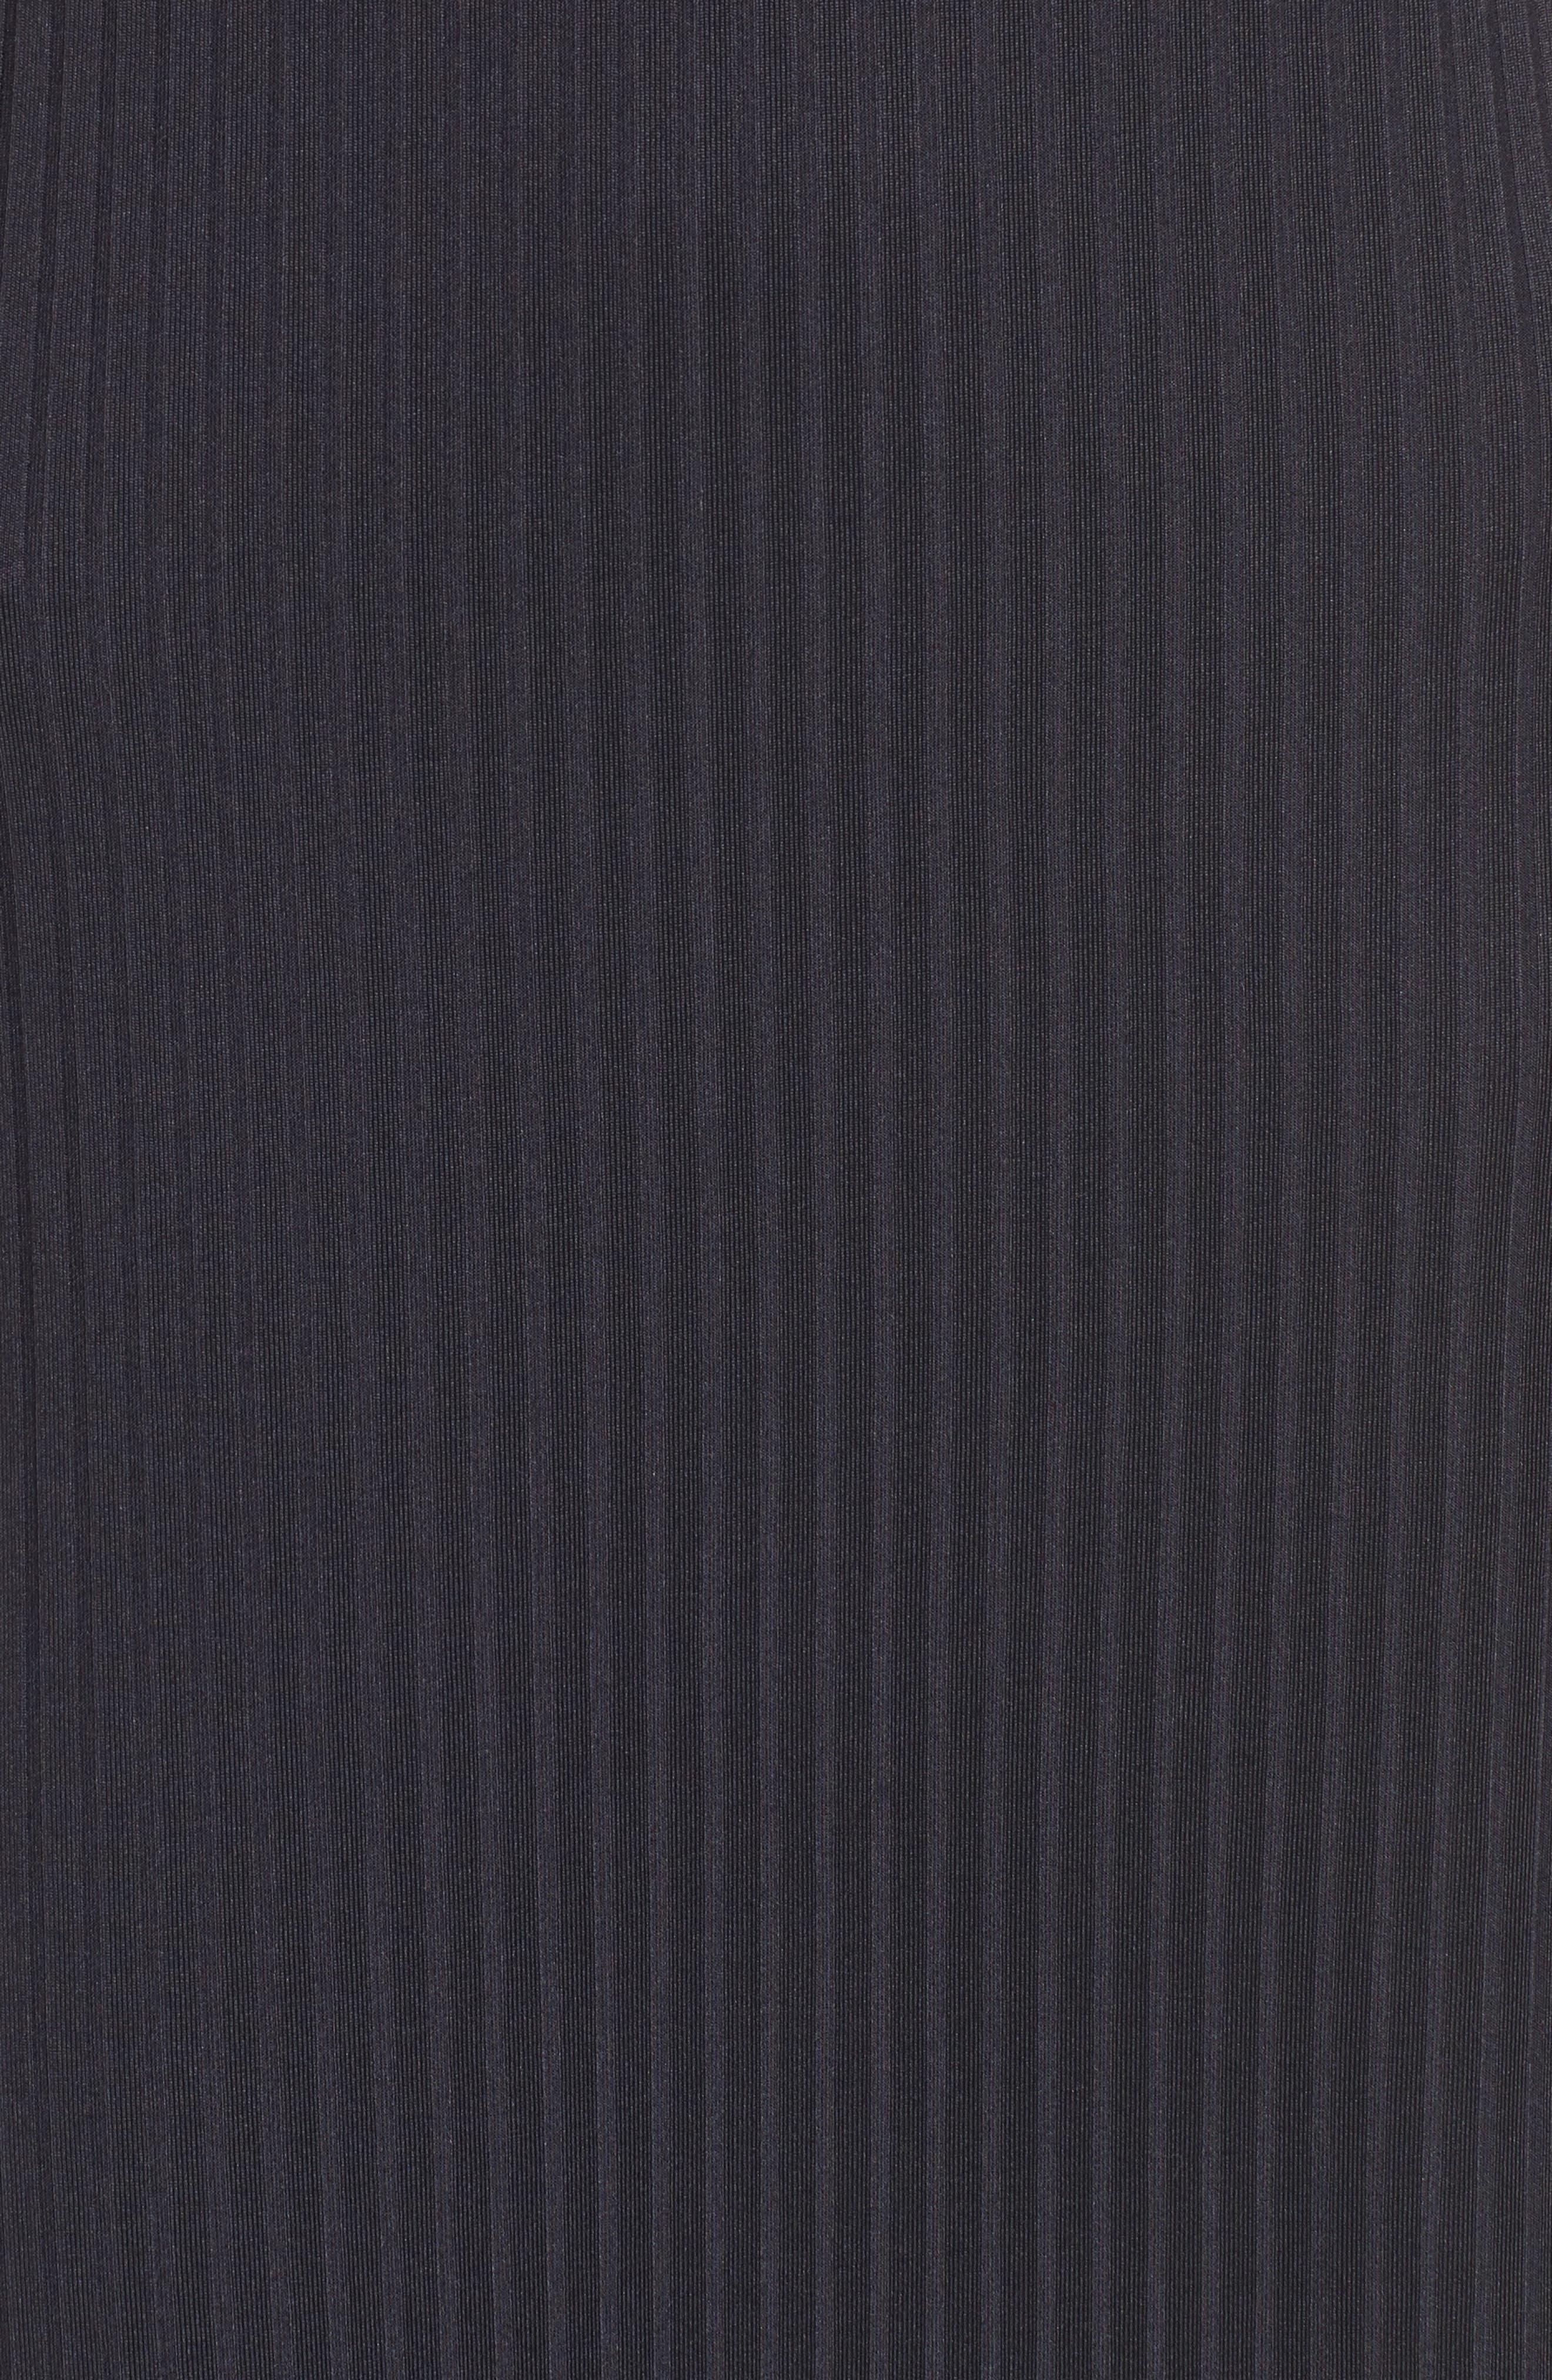 Ashlynn Ribbed Maxi Dress,                             Alternate thumbnail 5, color,                             NAVY